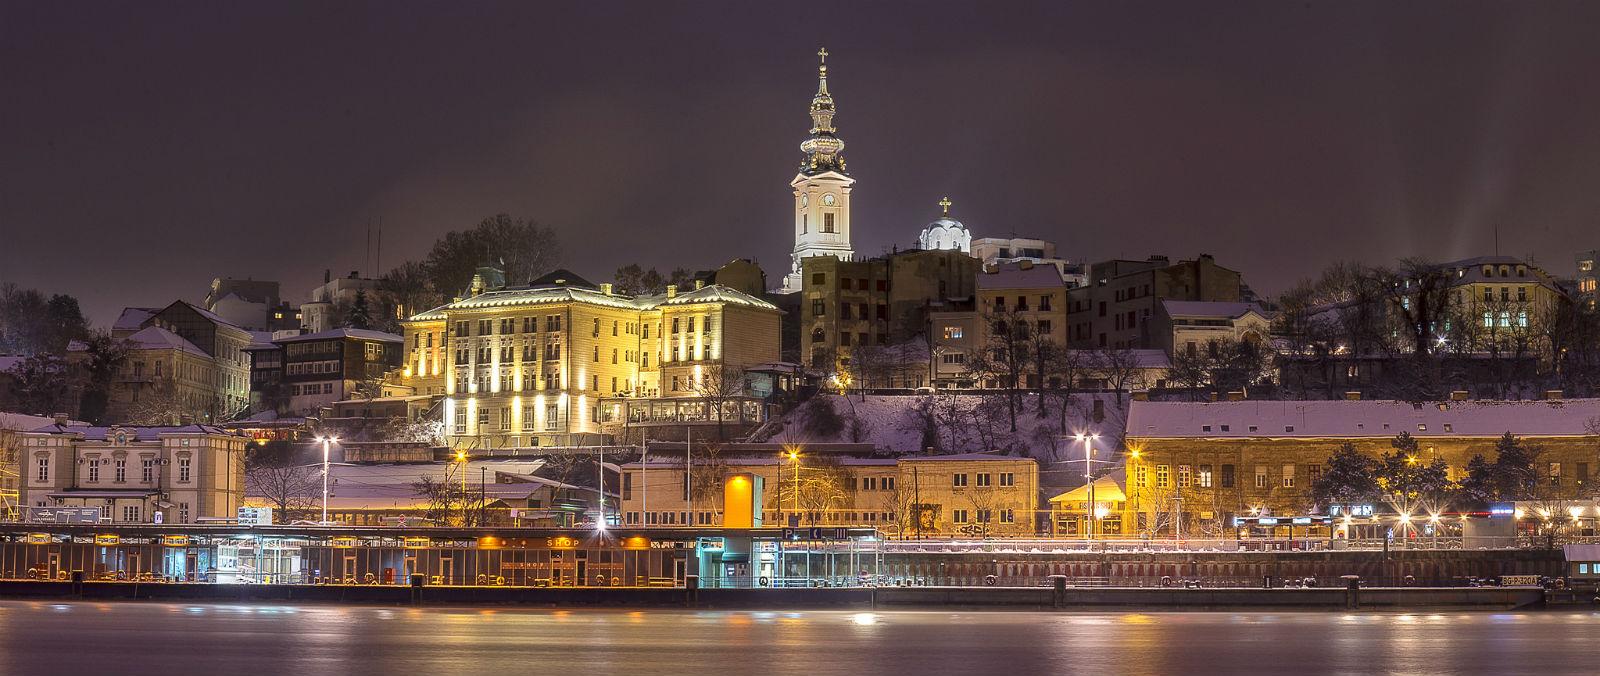 Serbian Religion - Churches and Basilicas in Belgrade saborna crkva